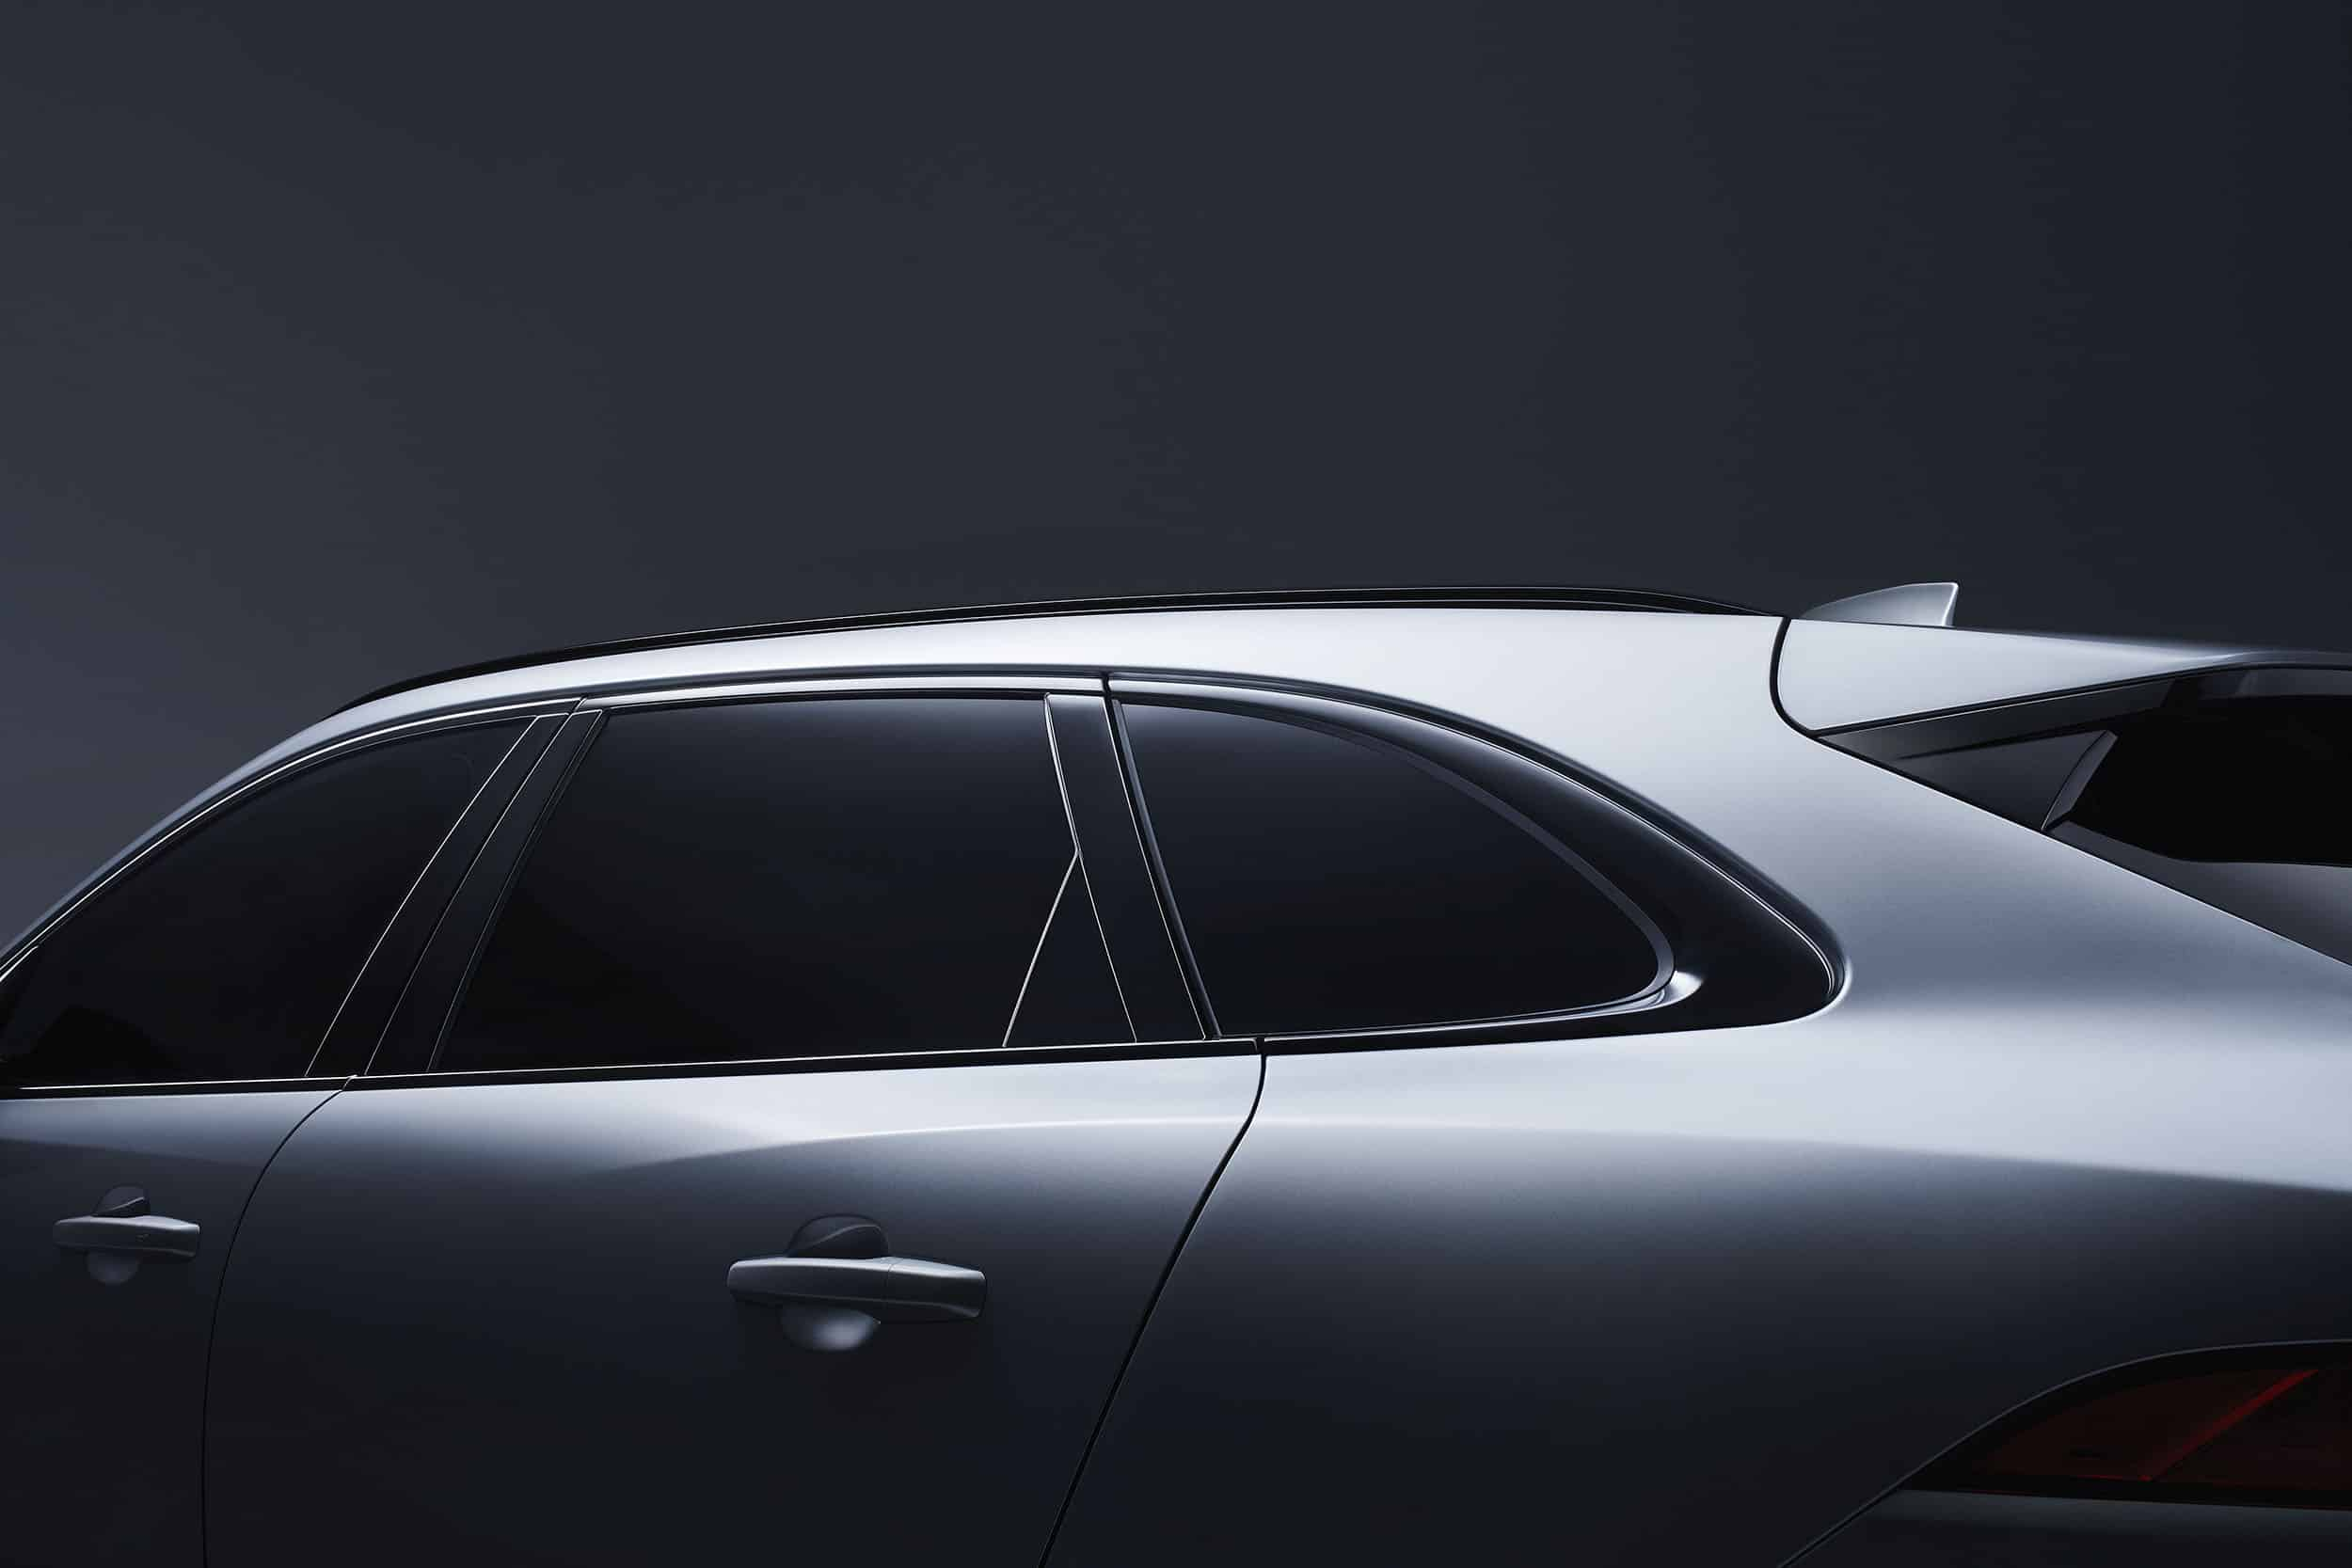 studio-ignatov-wkw-automotive-imagekampagne-bw-01